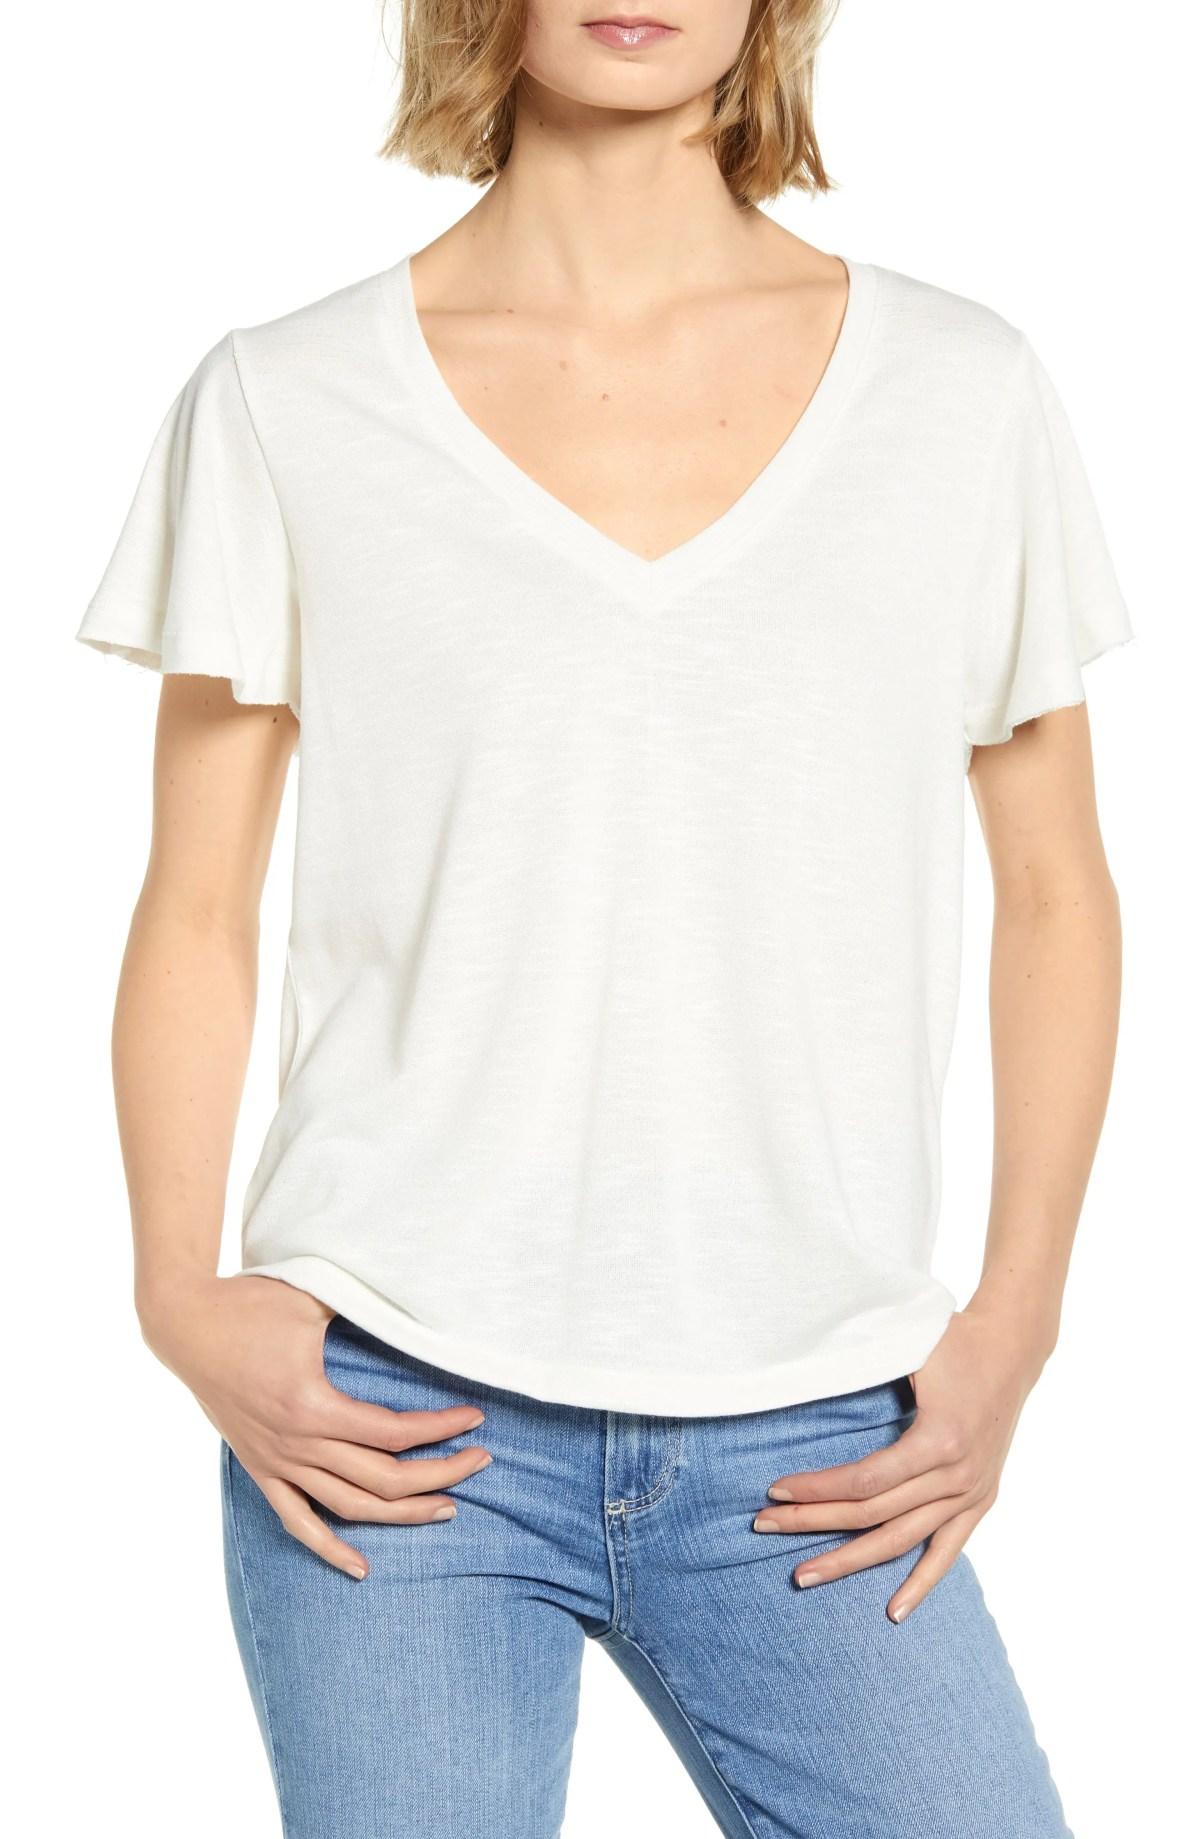 PAIGE Rochel Ruffle Sleeve T-Shirt, Main, color, VANILLA / IVORY